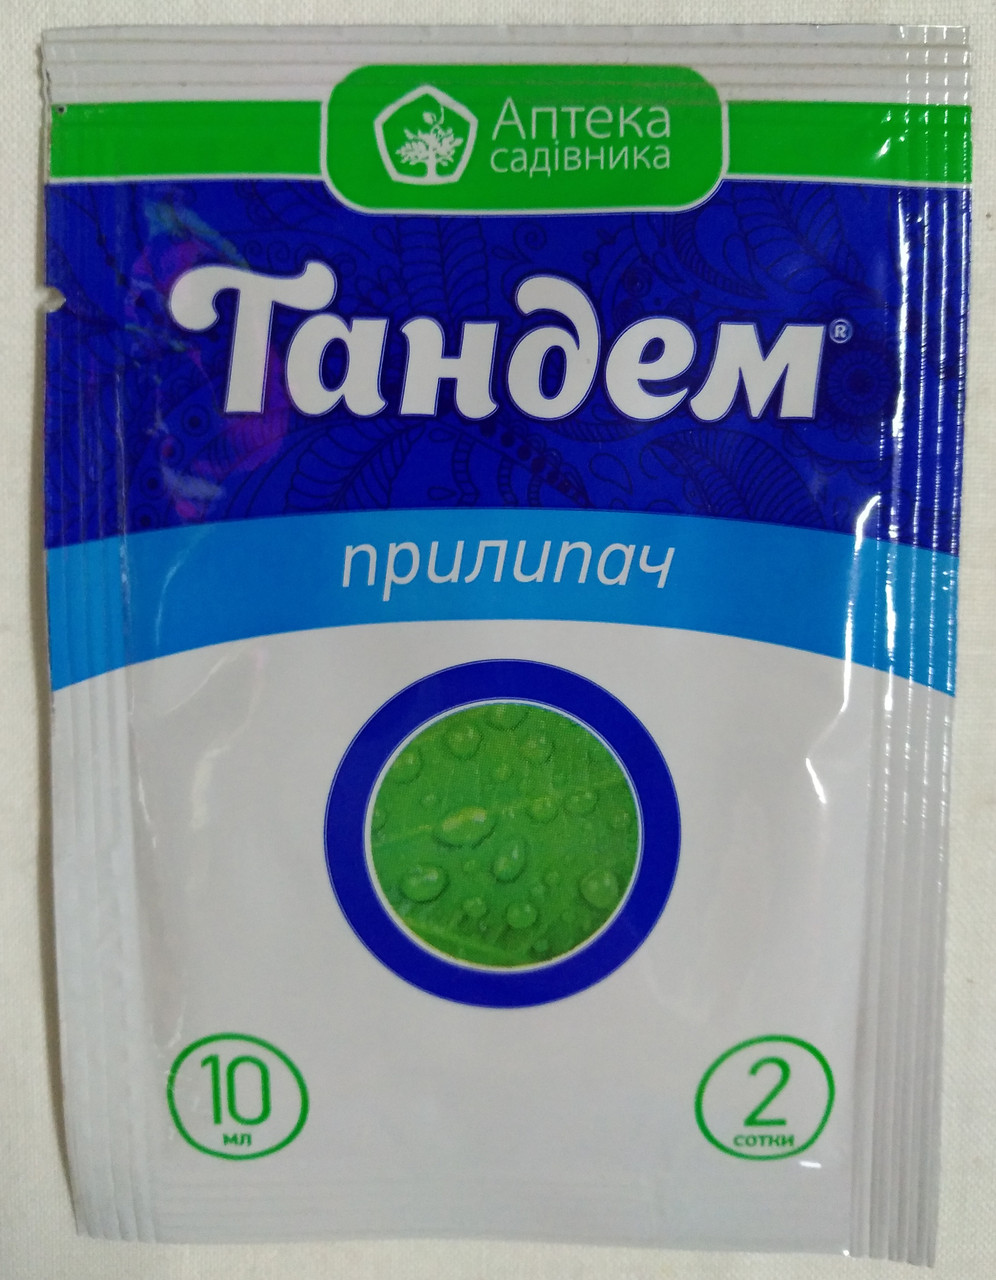 Тандем 10 мл